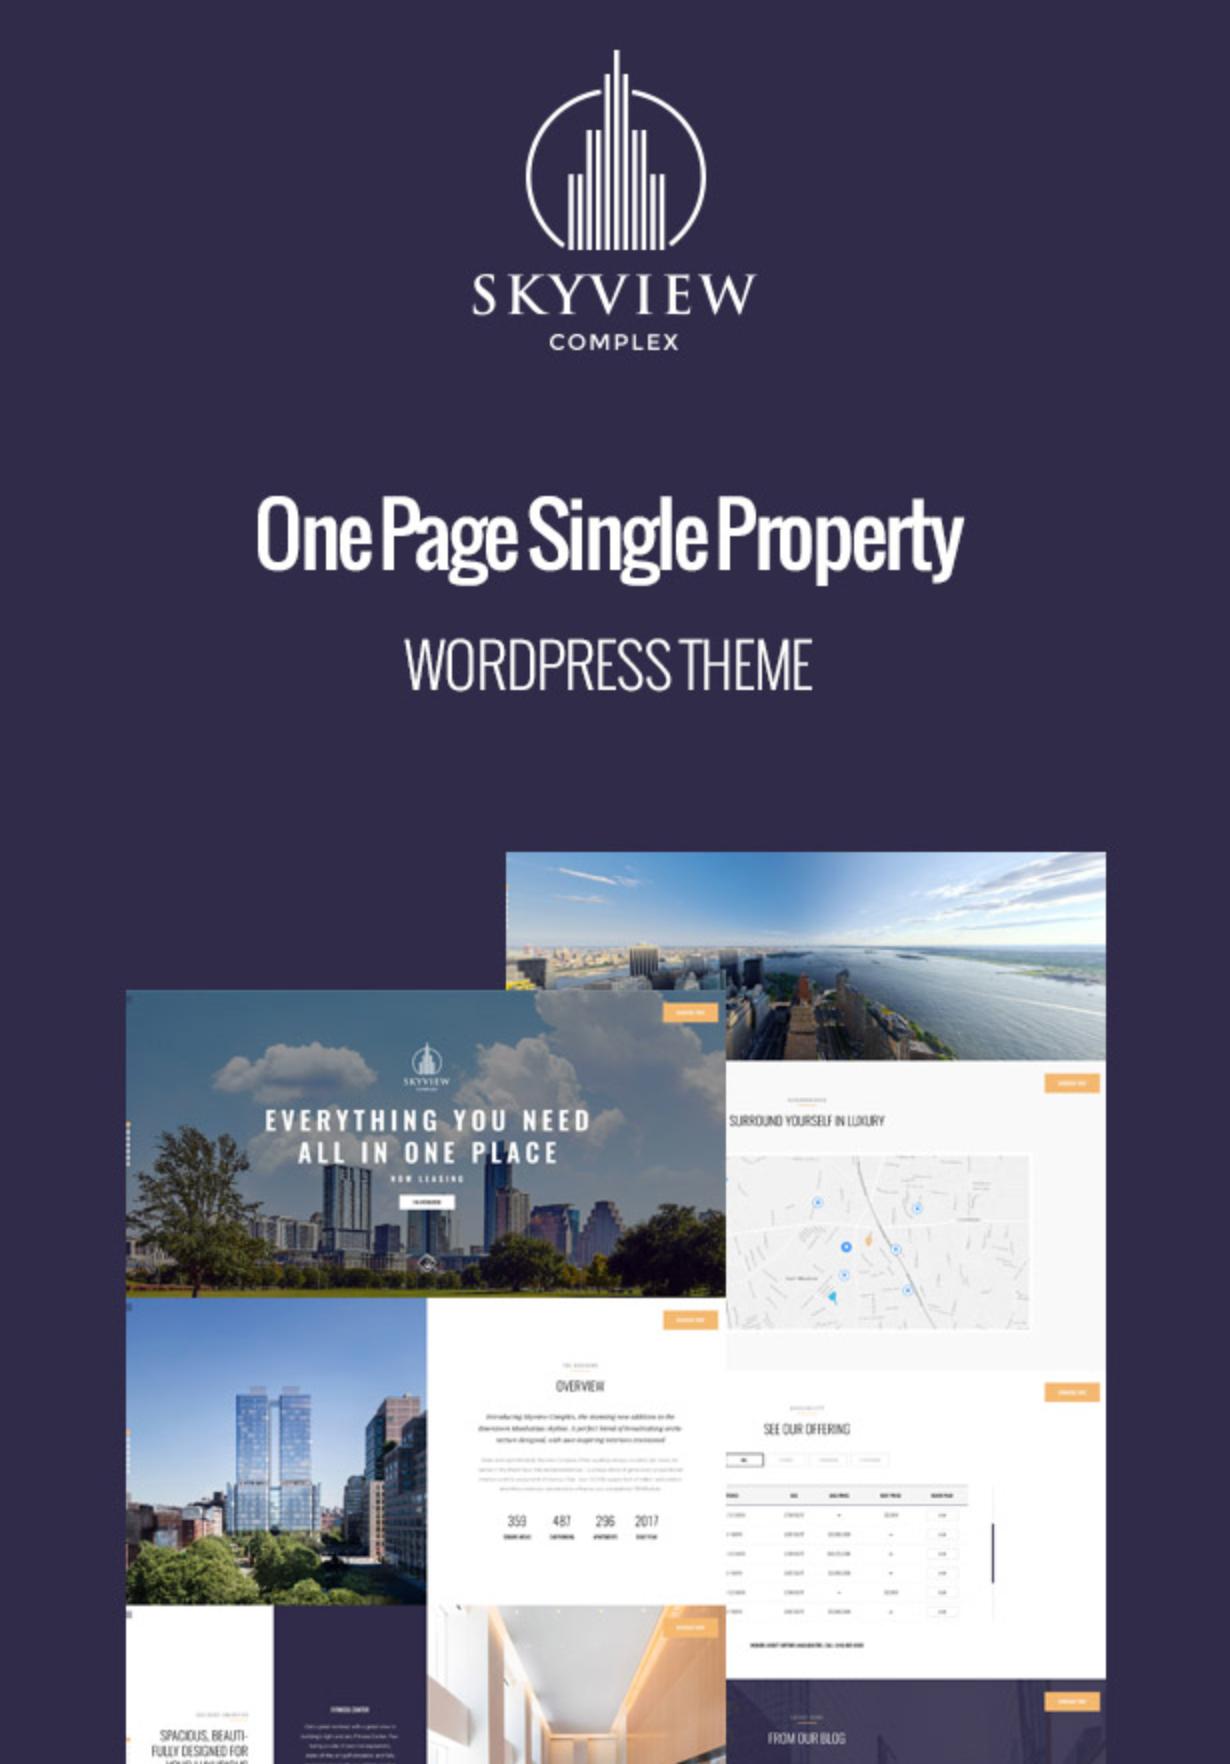 Skyview Complex Best One Page Einzelimmobilien & Immobilien WordPress-Themes